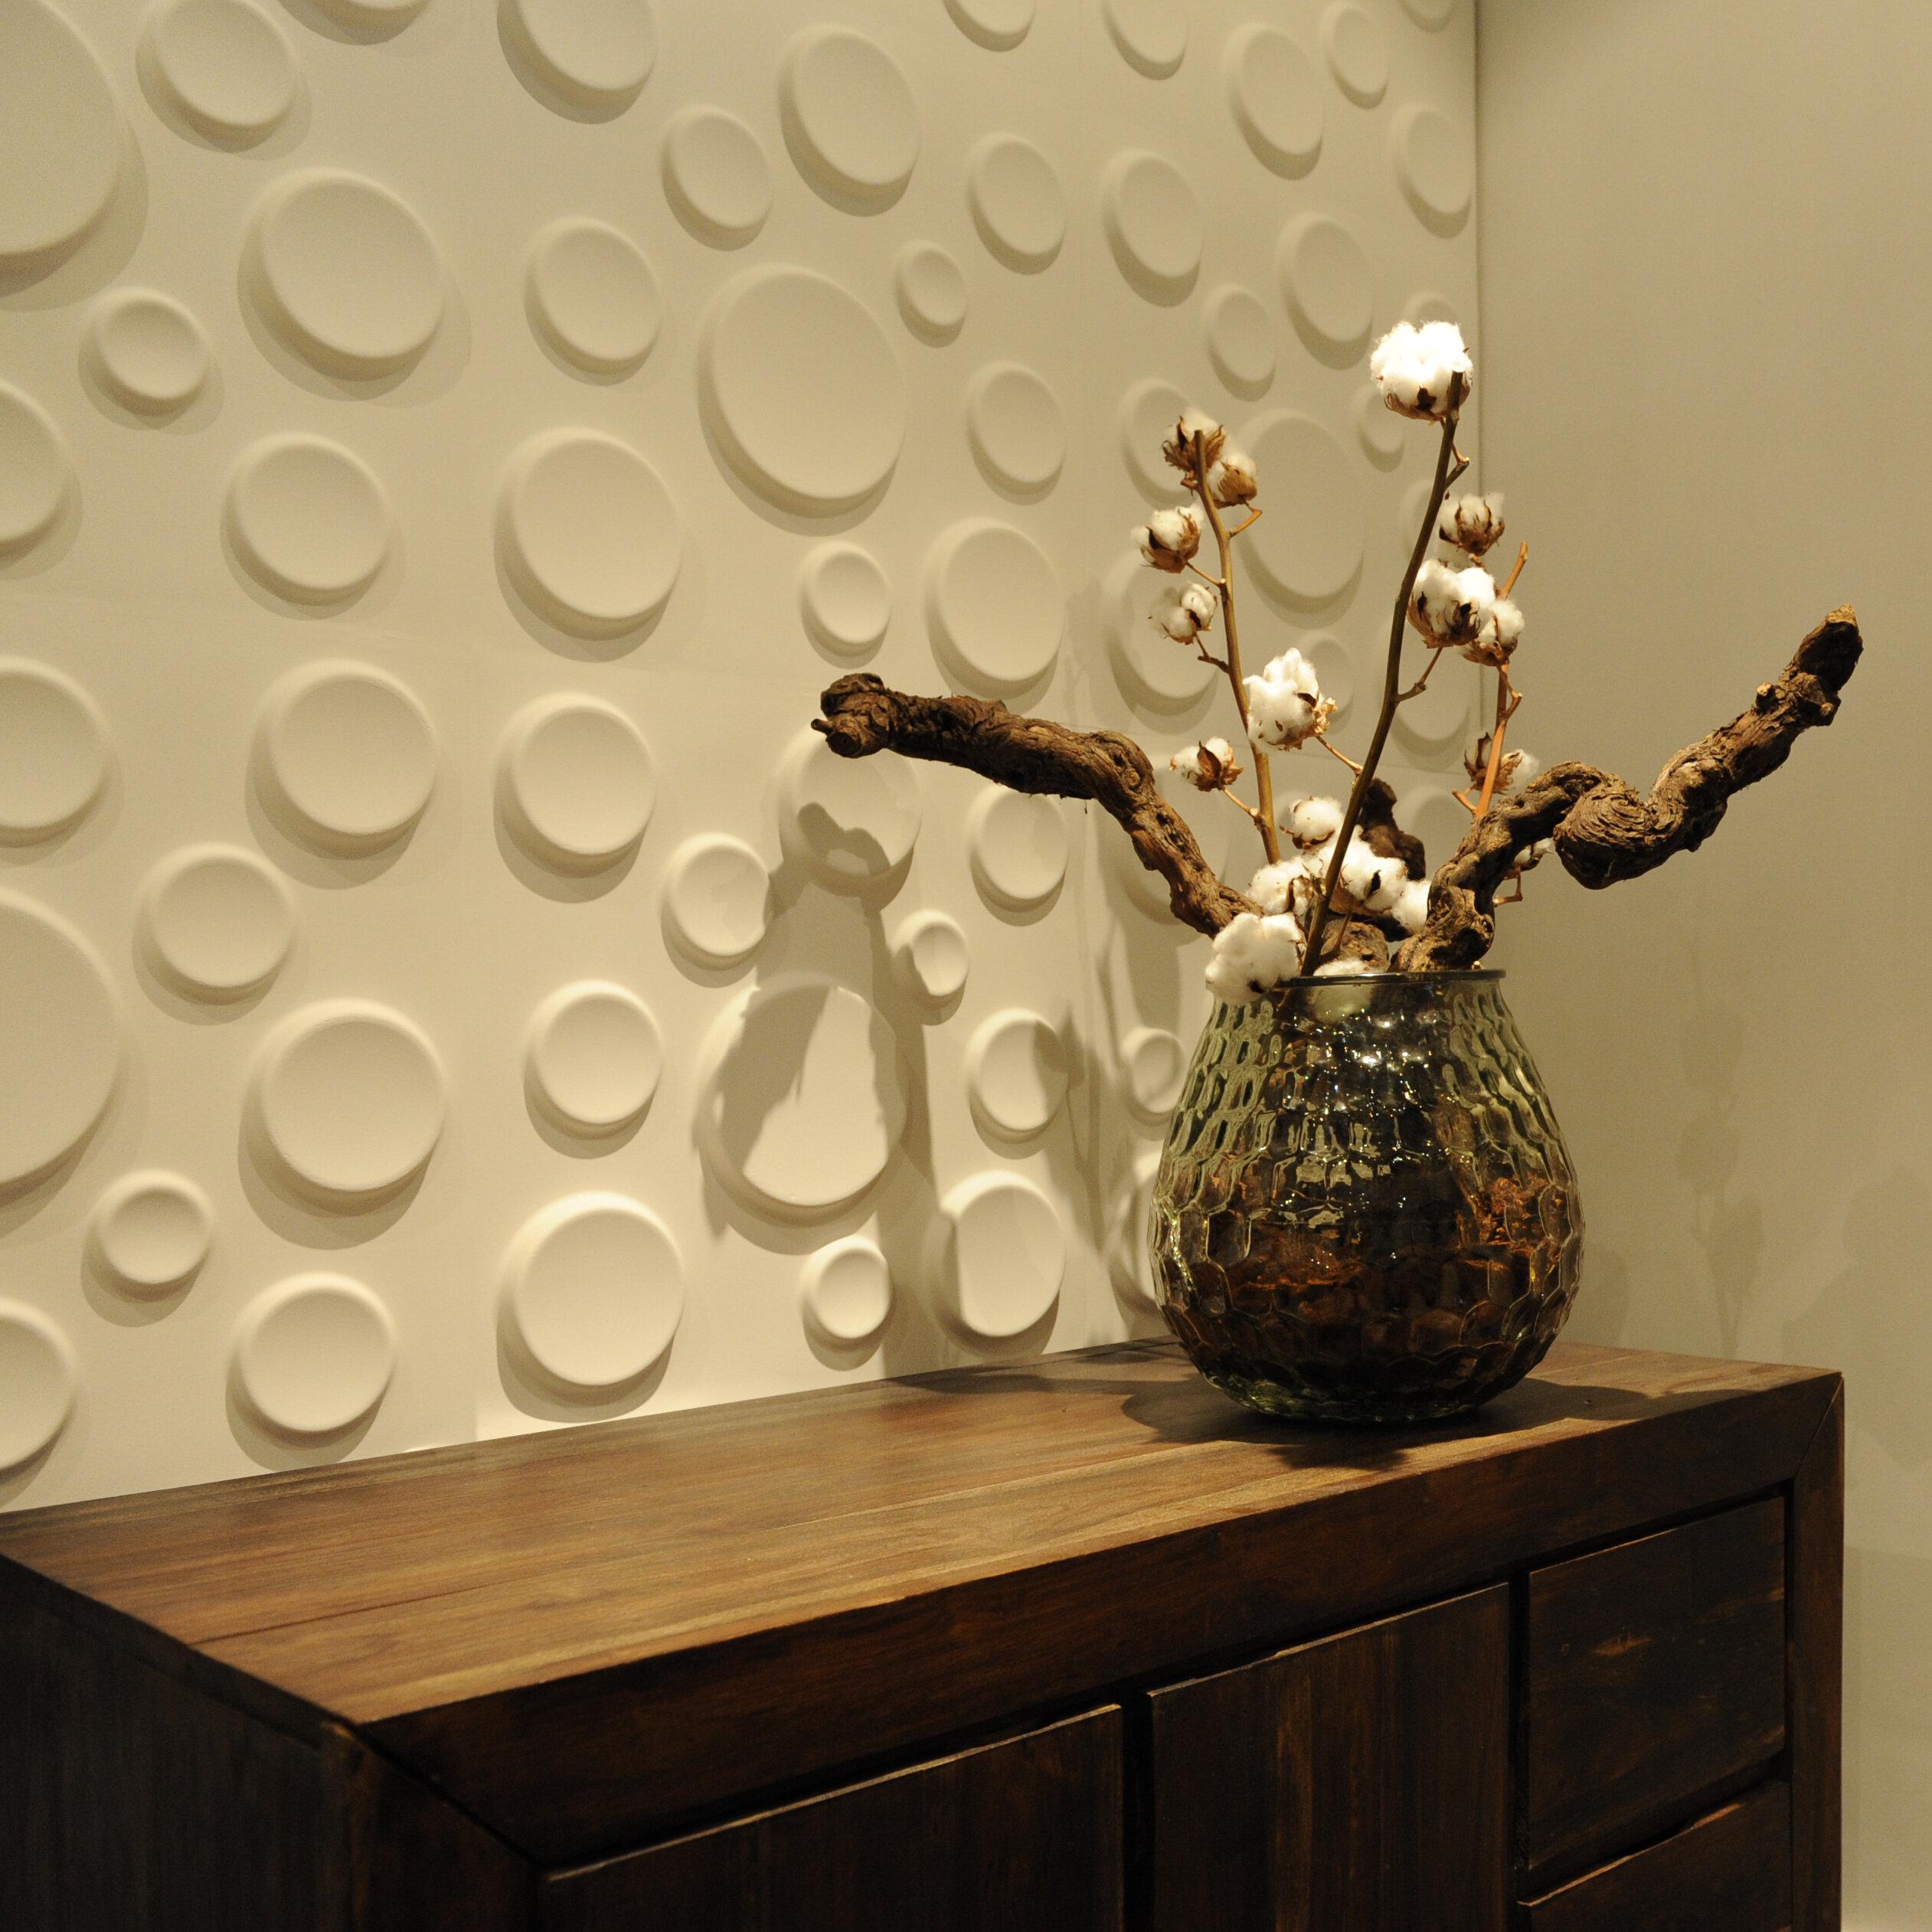 Luxury Decorative Vent Covers Wall Adornment - Art & Wall Decor ...